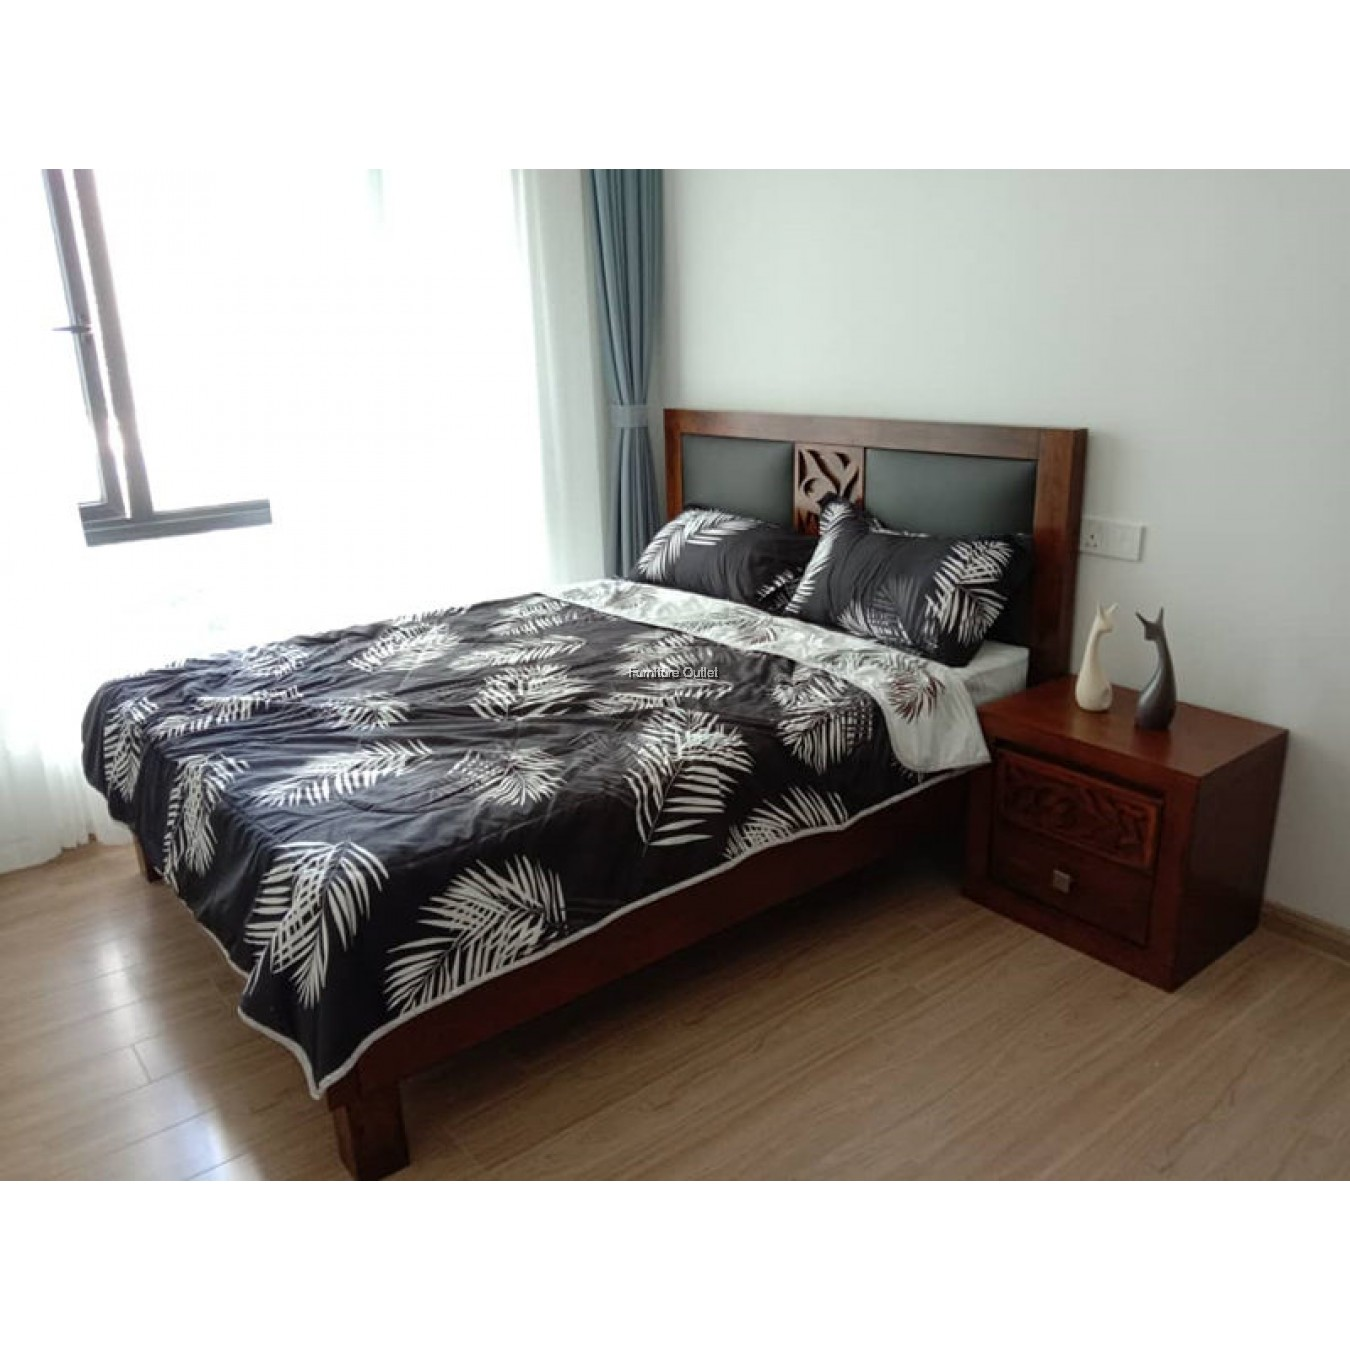 FULL SOLID WOOD BEDROOM SET - 2